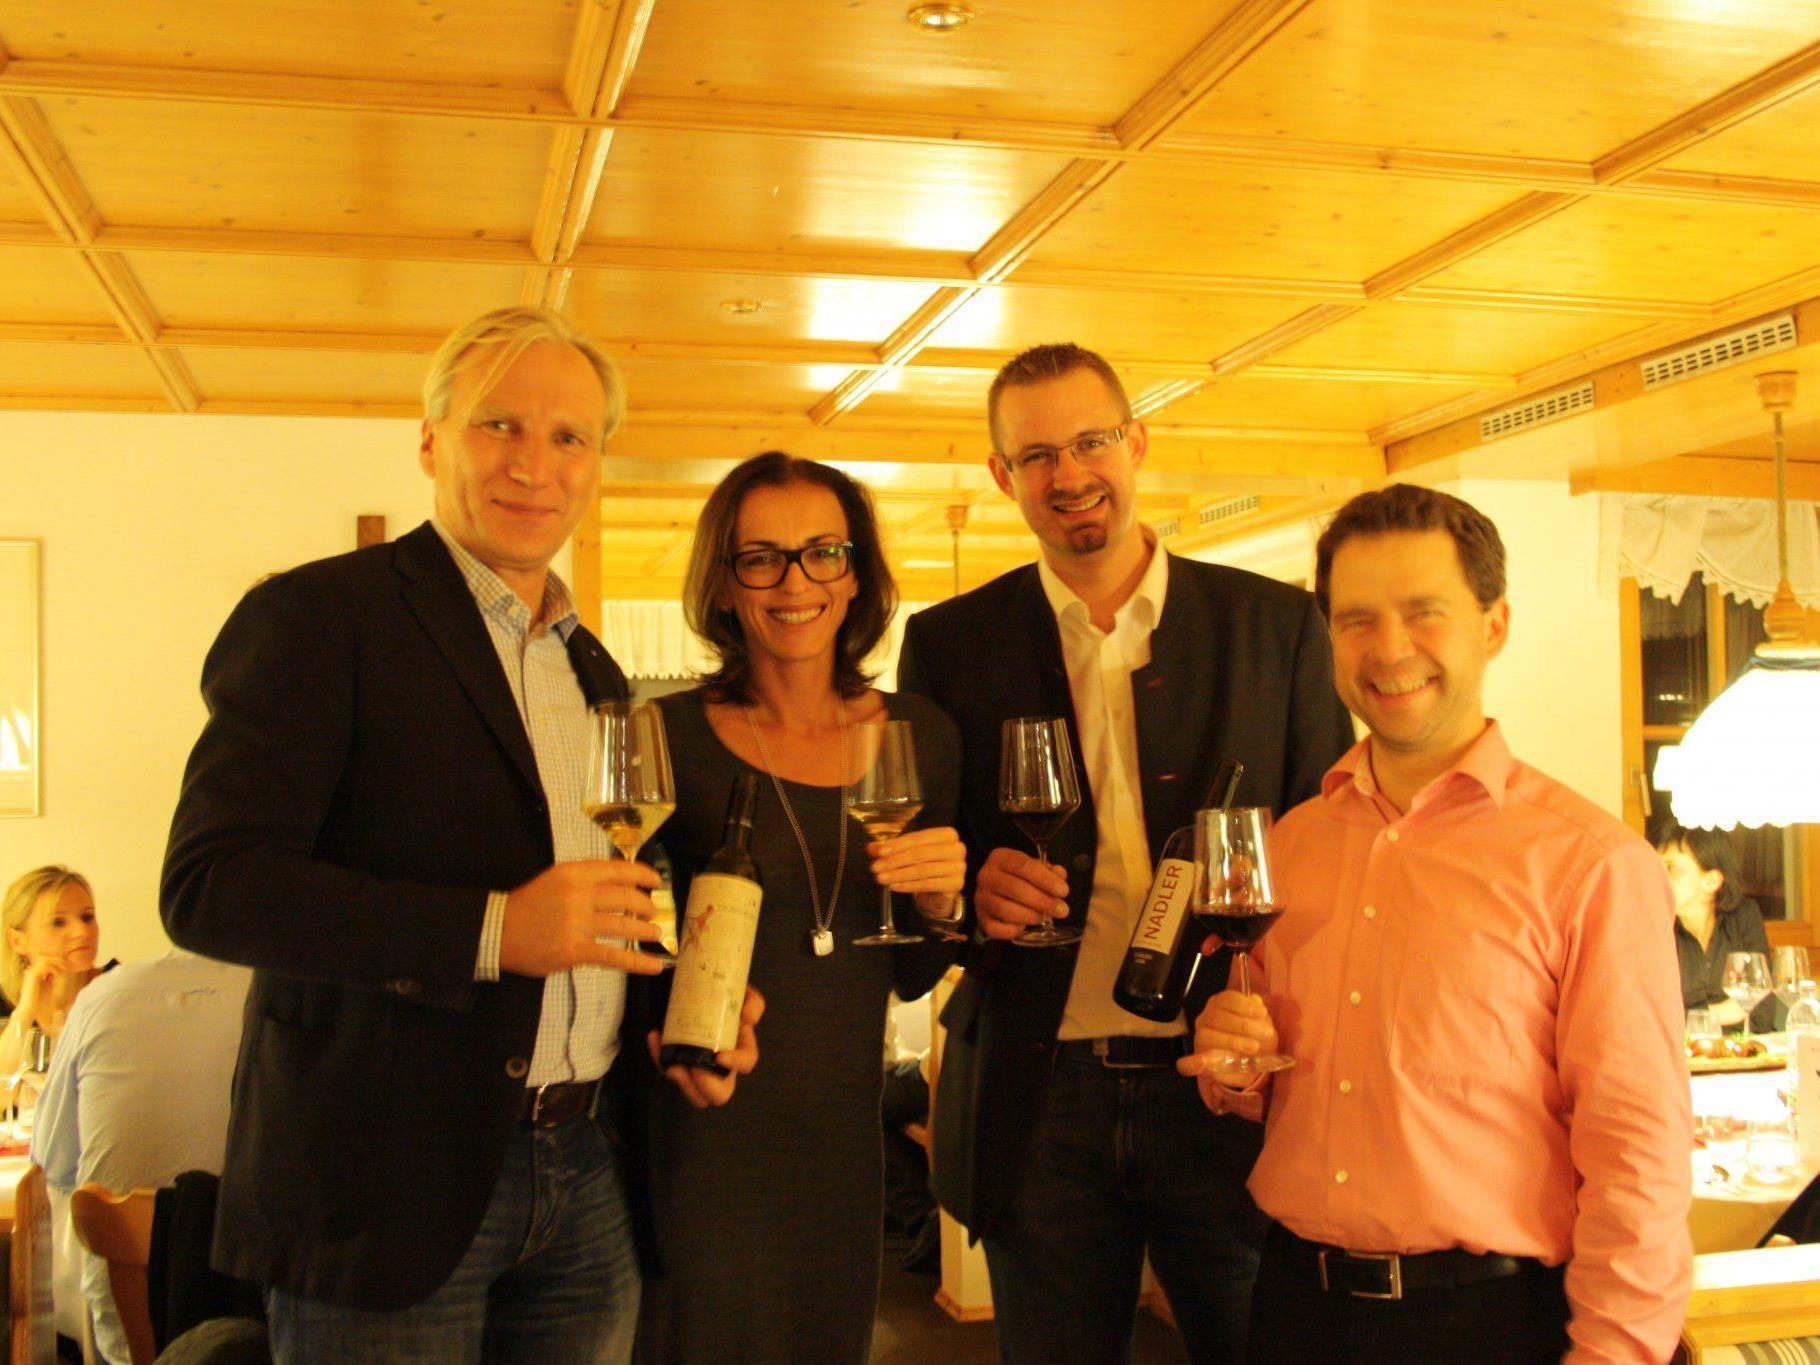 Wein-Kenner: Georg Klein mit Gattin (Dürnberg), Robert Nadler (Weingut Nadler), Christian Eibl (AGM)